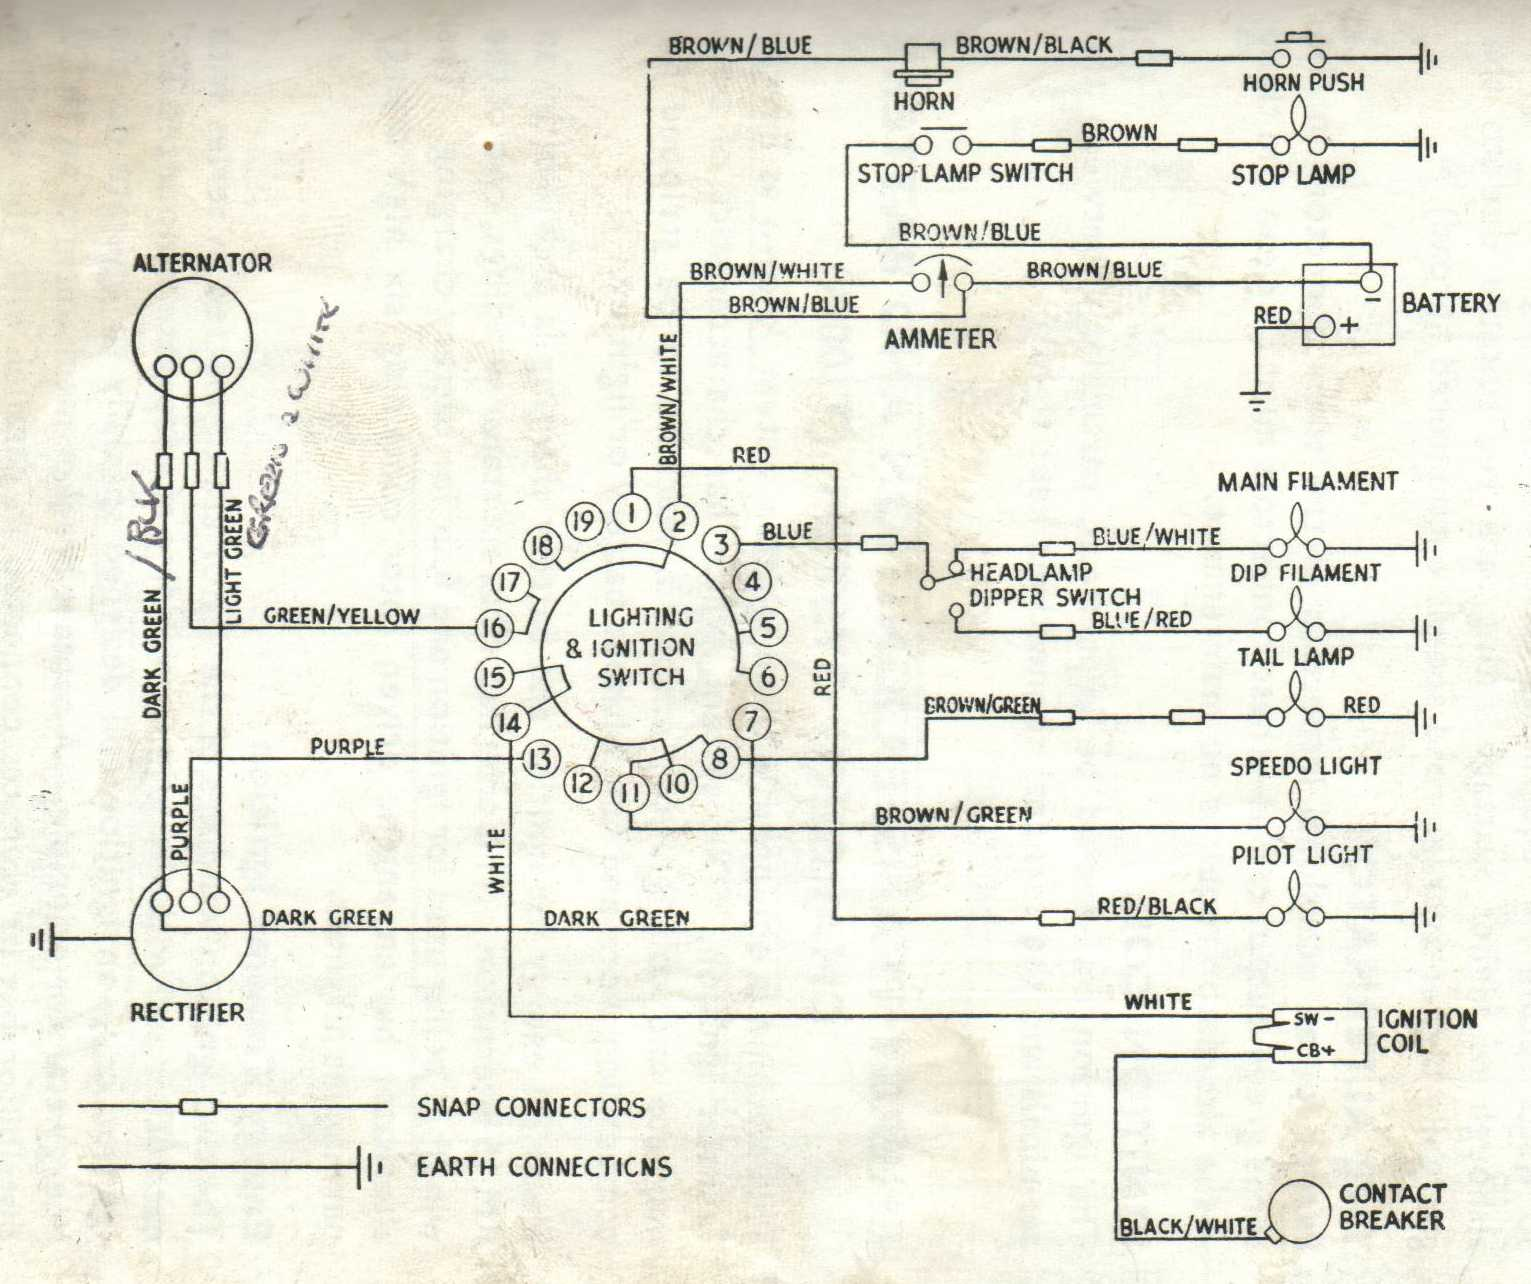 [WLLP_2054]   SX_2272] Odes Atv Winch Wiring Diagram | Triumph Boat Wiring Diagram |  | Gue45 Xlexi Abole Phan Gious Sequ Diog Ginou Pelap Elec Mohammedshrine  Librar Wiring 101